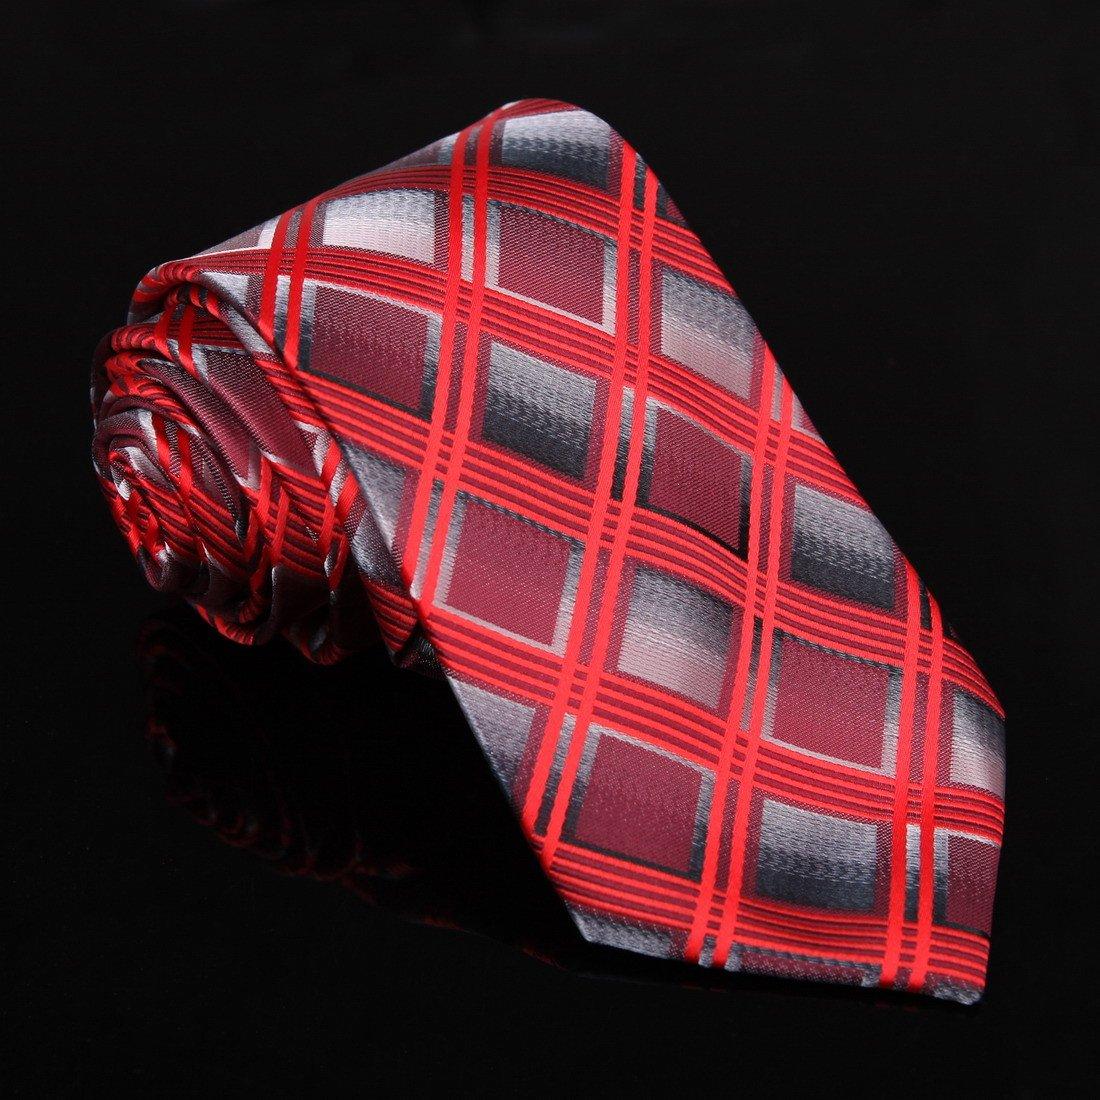 DAA7C10F Purple Orange Red Checkered Microfiber Neck Tie Thank You For Bridegrooms Tie By Dan Smith